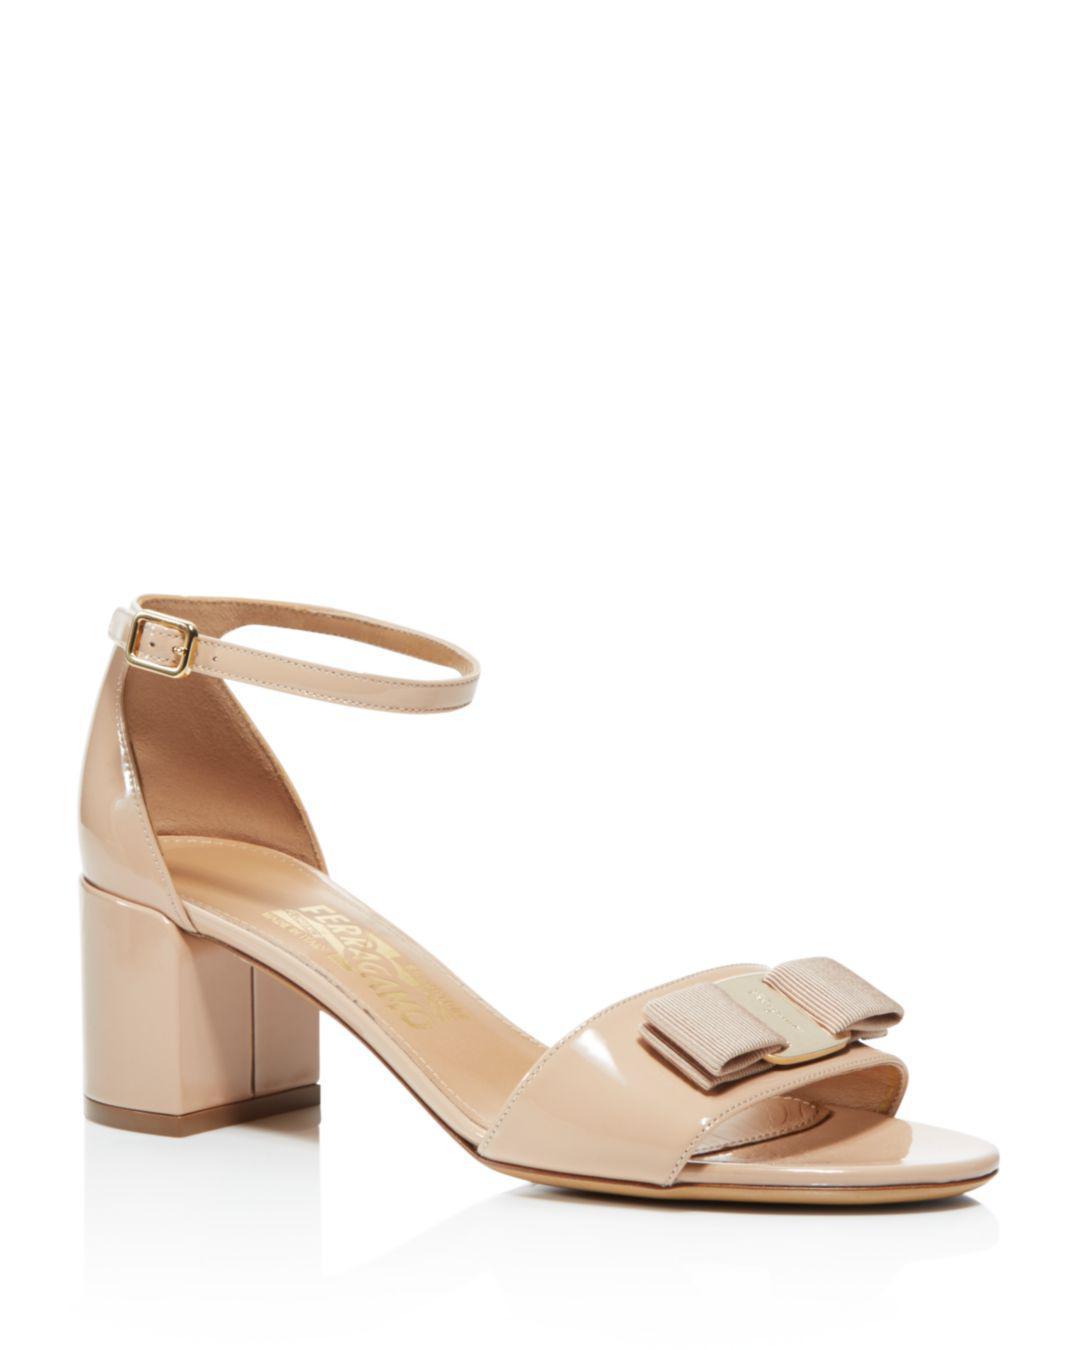 b05fa0d3a073 Ferragamo. Natural Women s Gavina Ankle Strap Block Heel Sandals